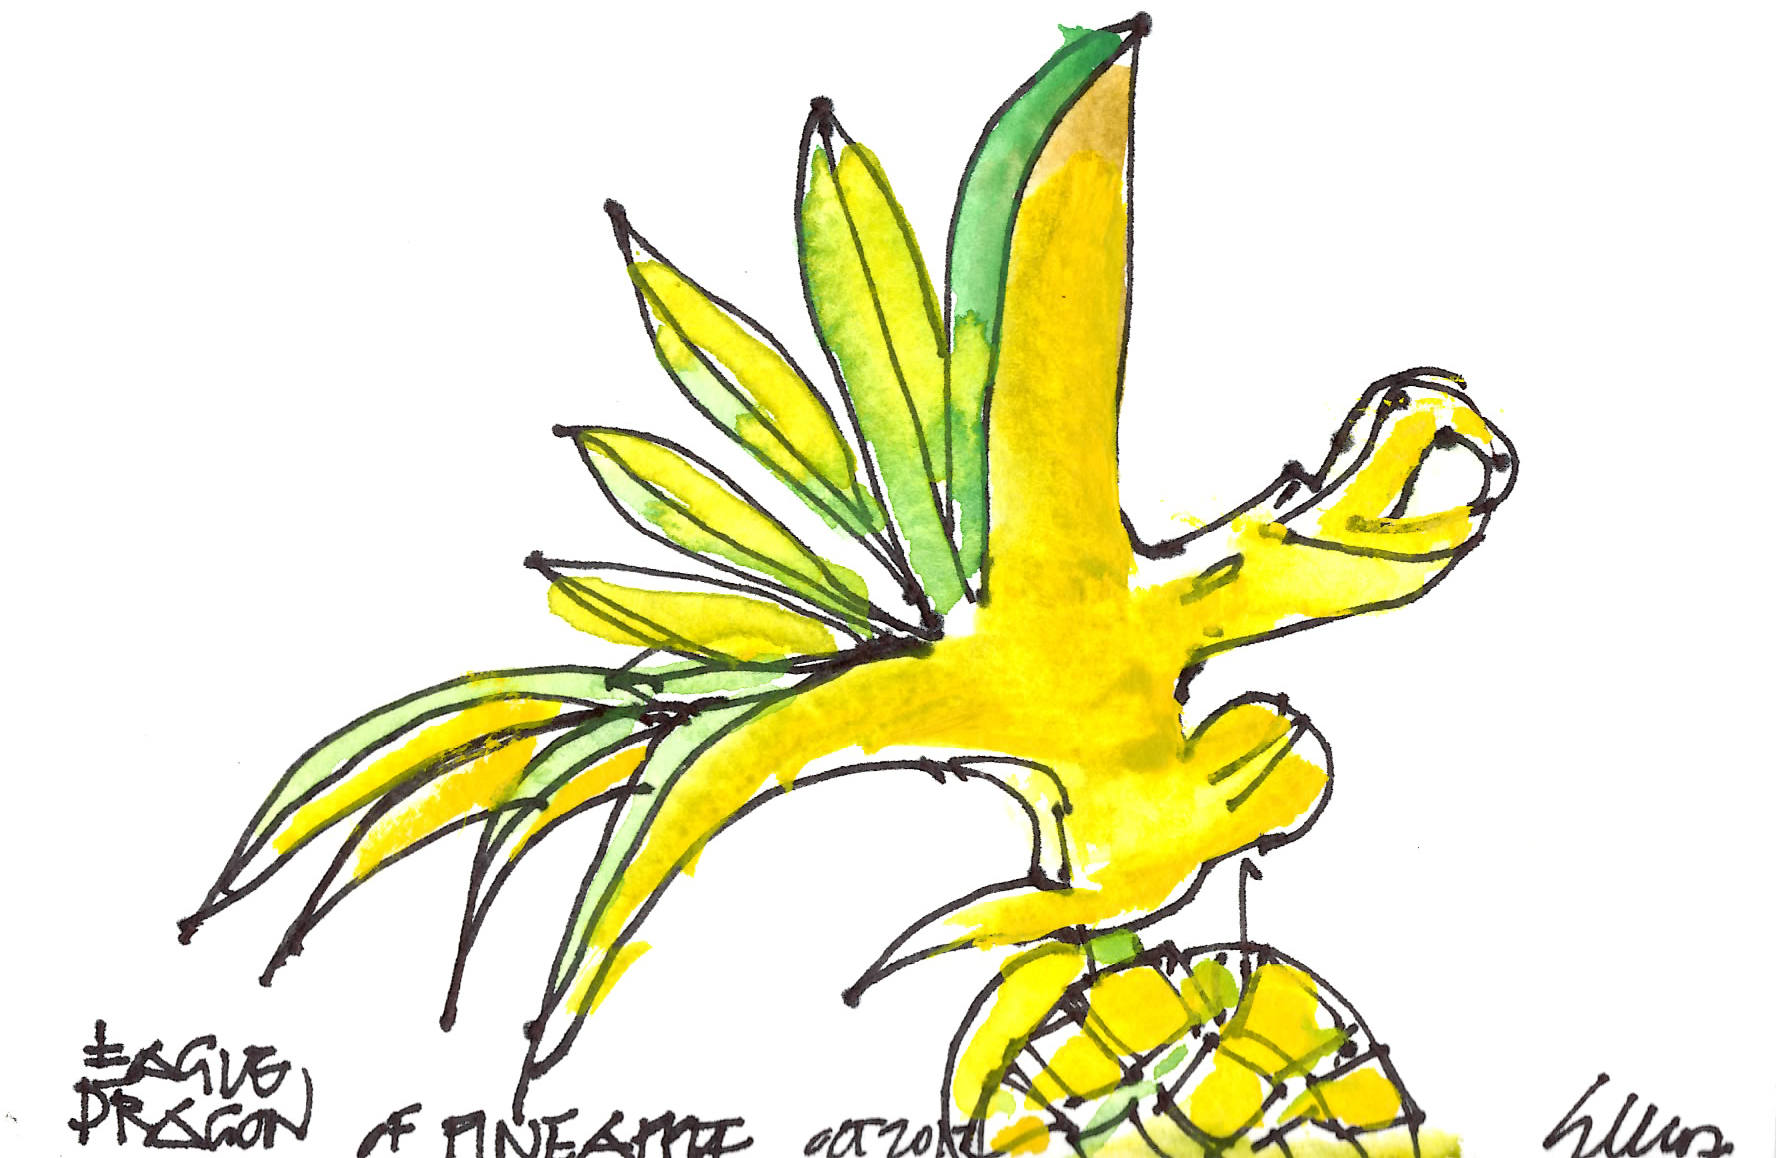 eagle dragon of pineapple 10.13